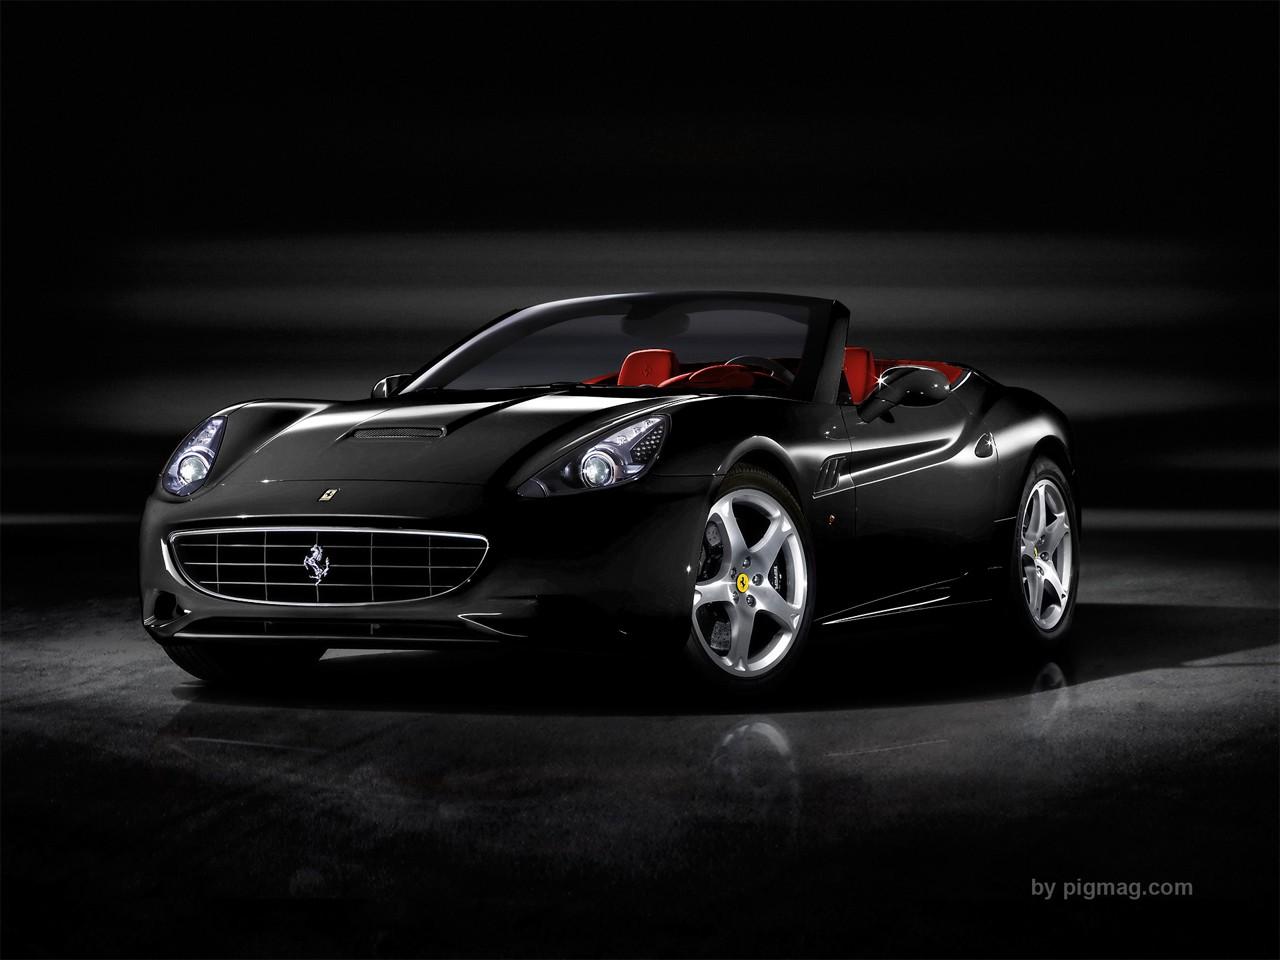 2012 Lamborghini Aventador Ferrari California Black